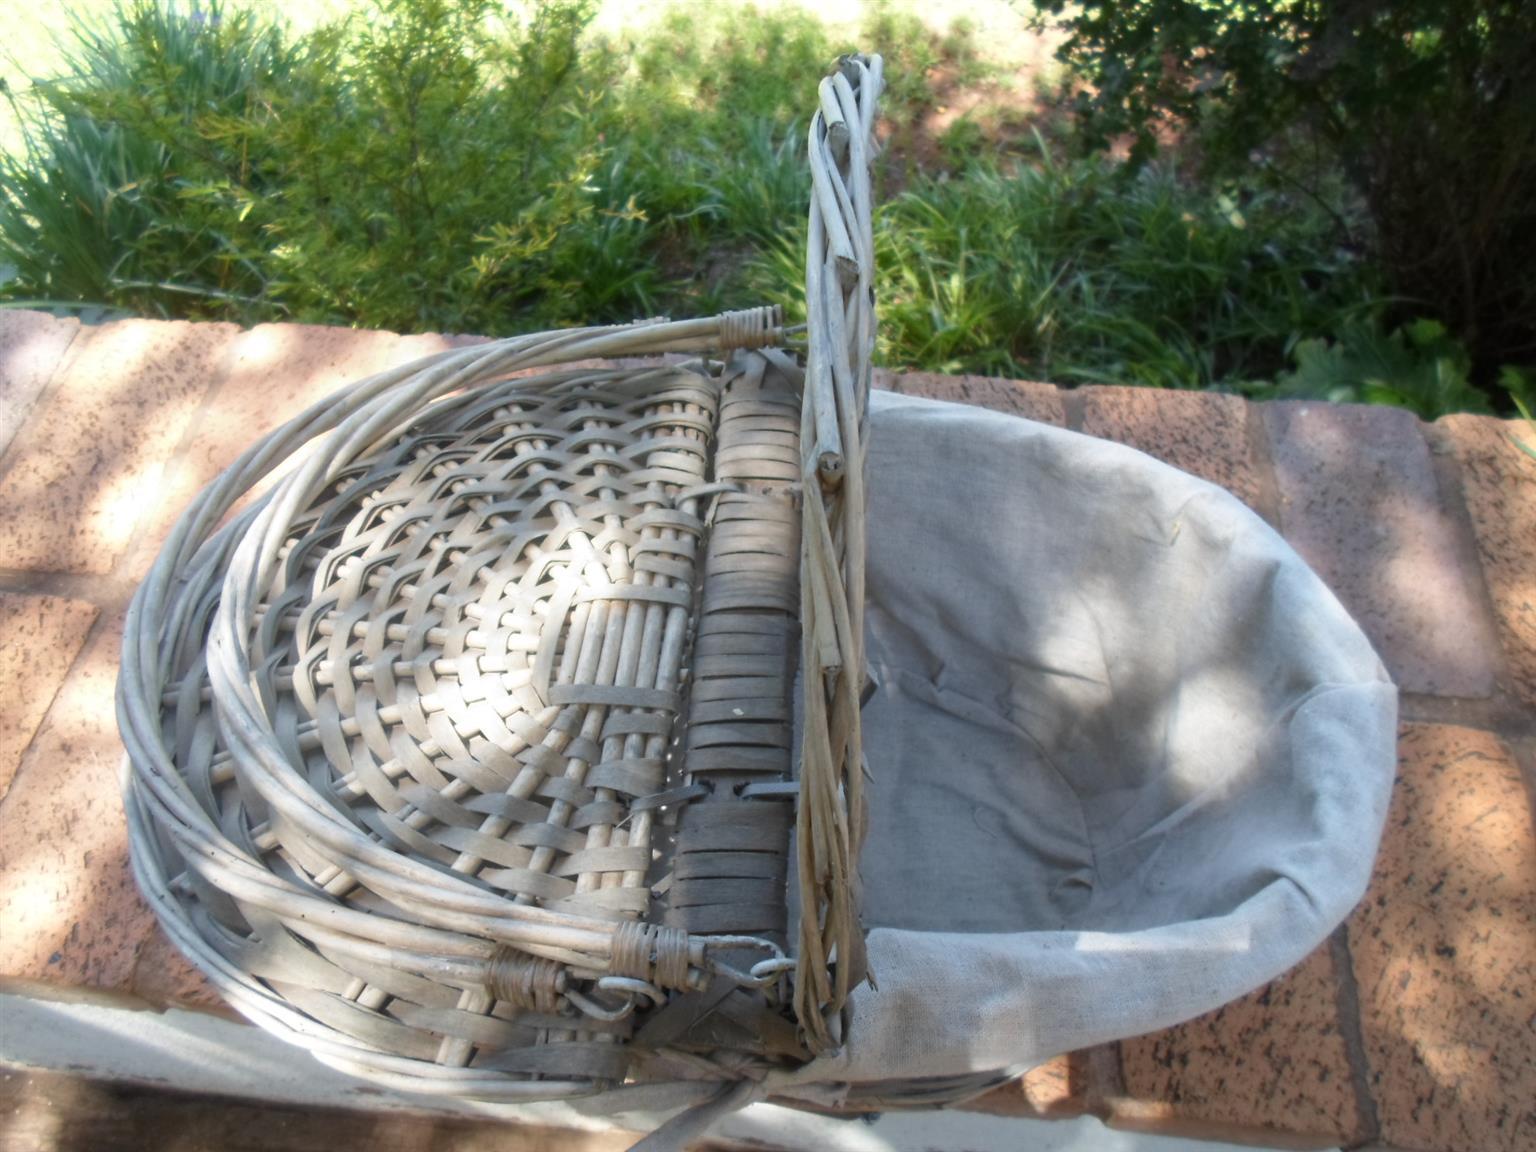 Gazeboo and Picnic Basket